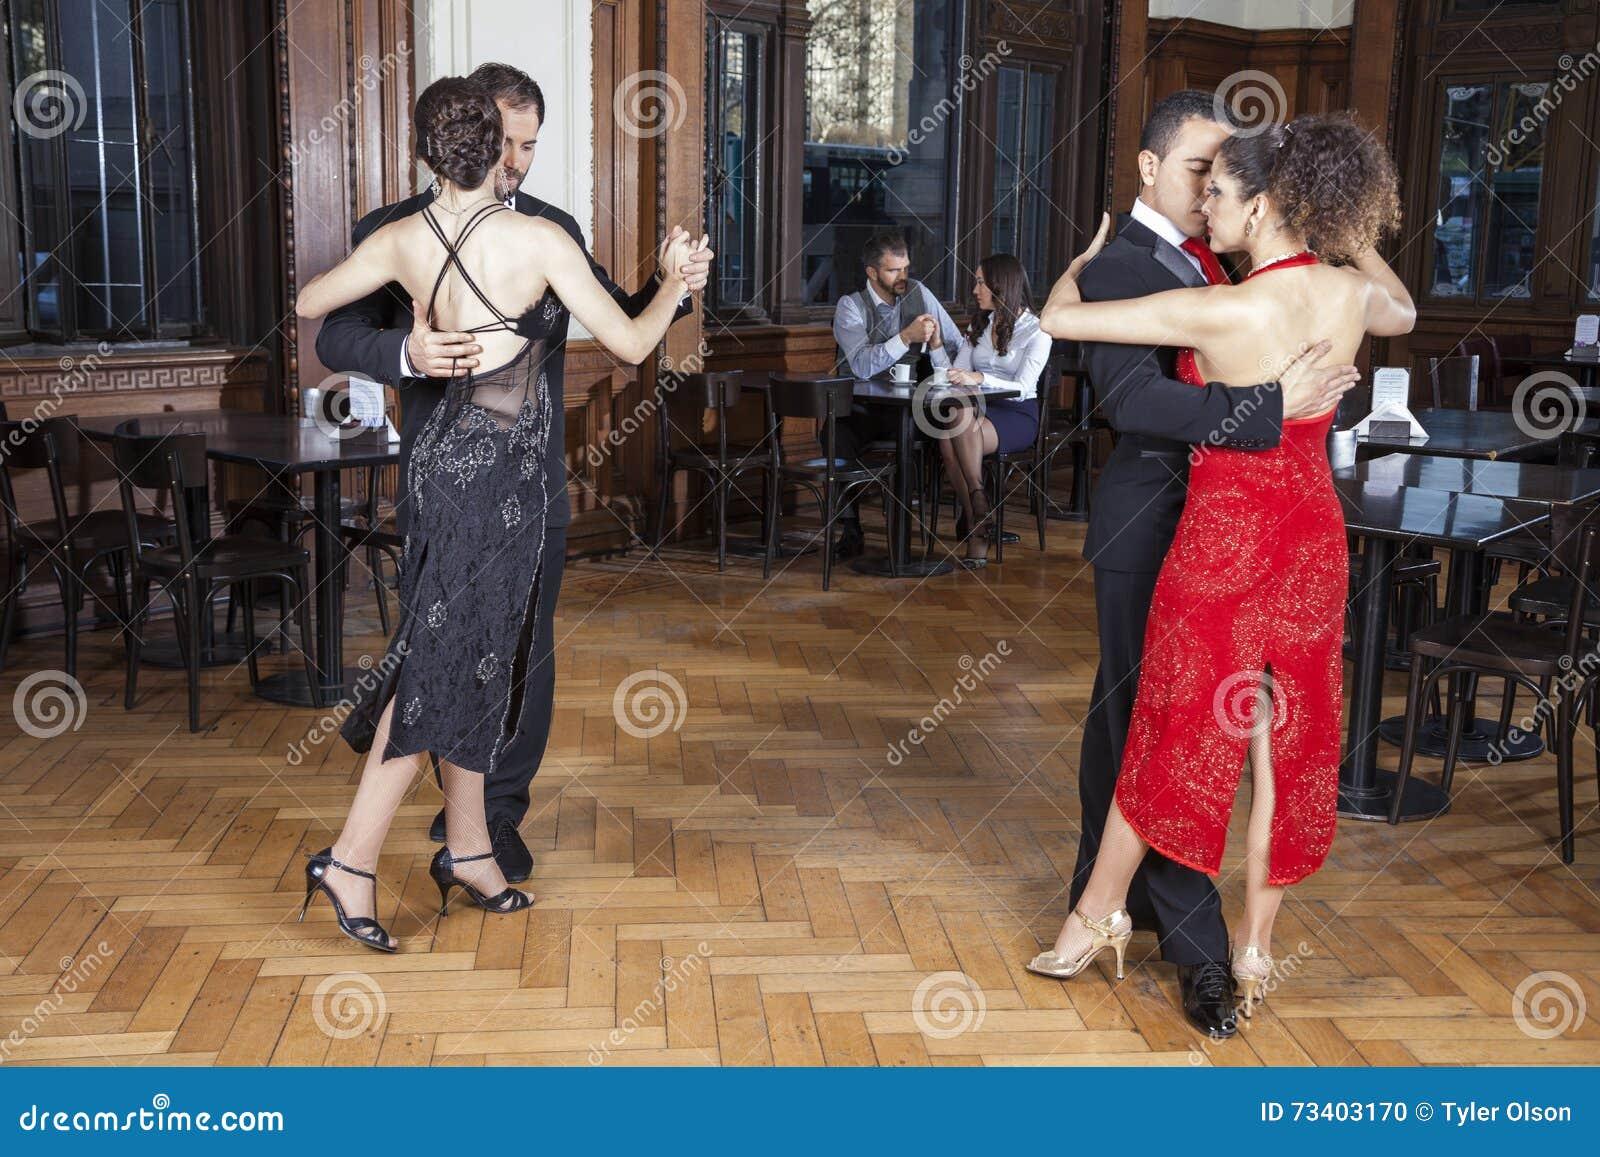 tango phone dating